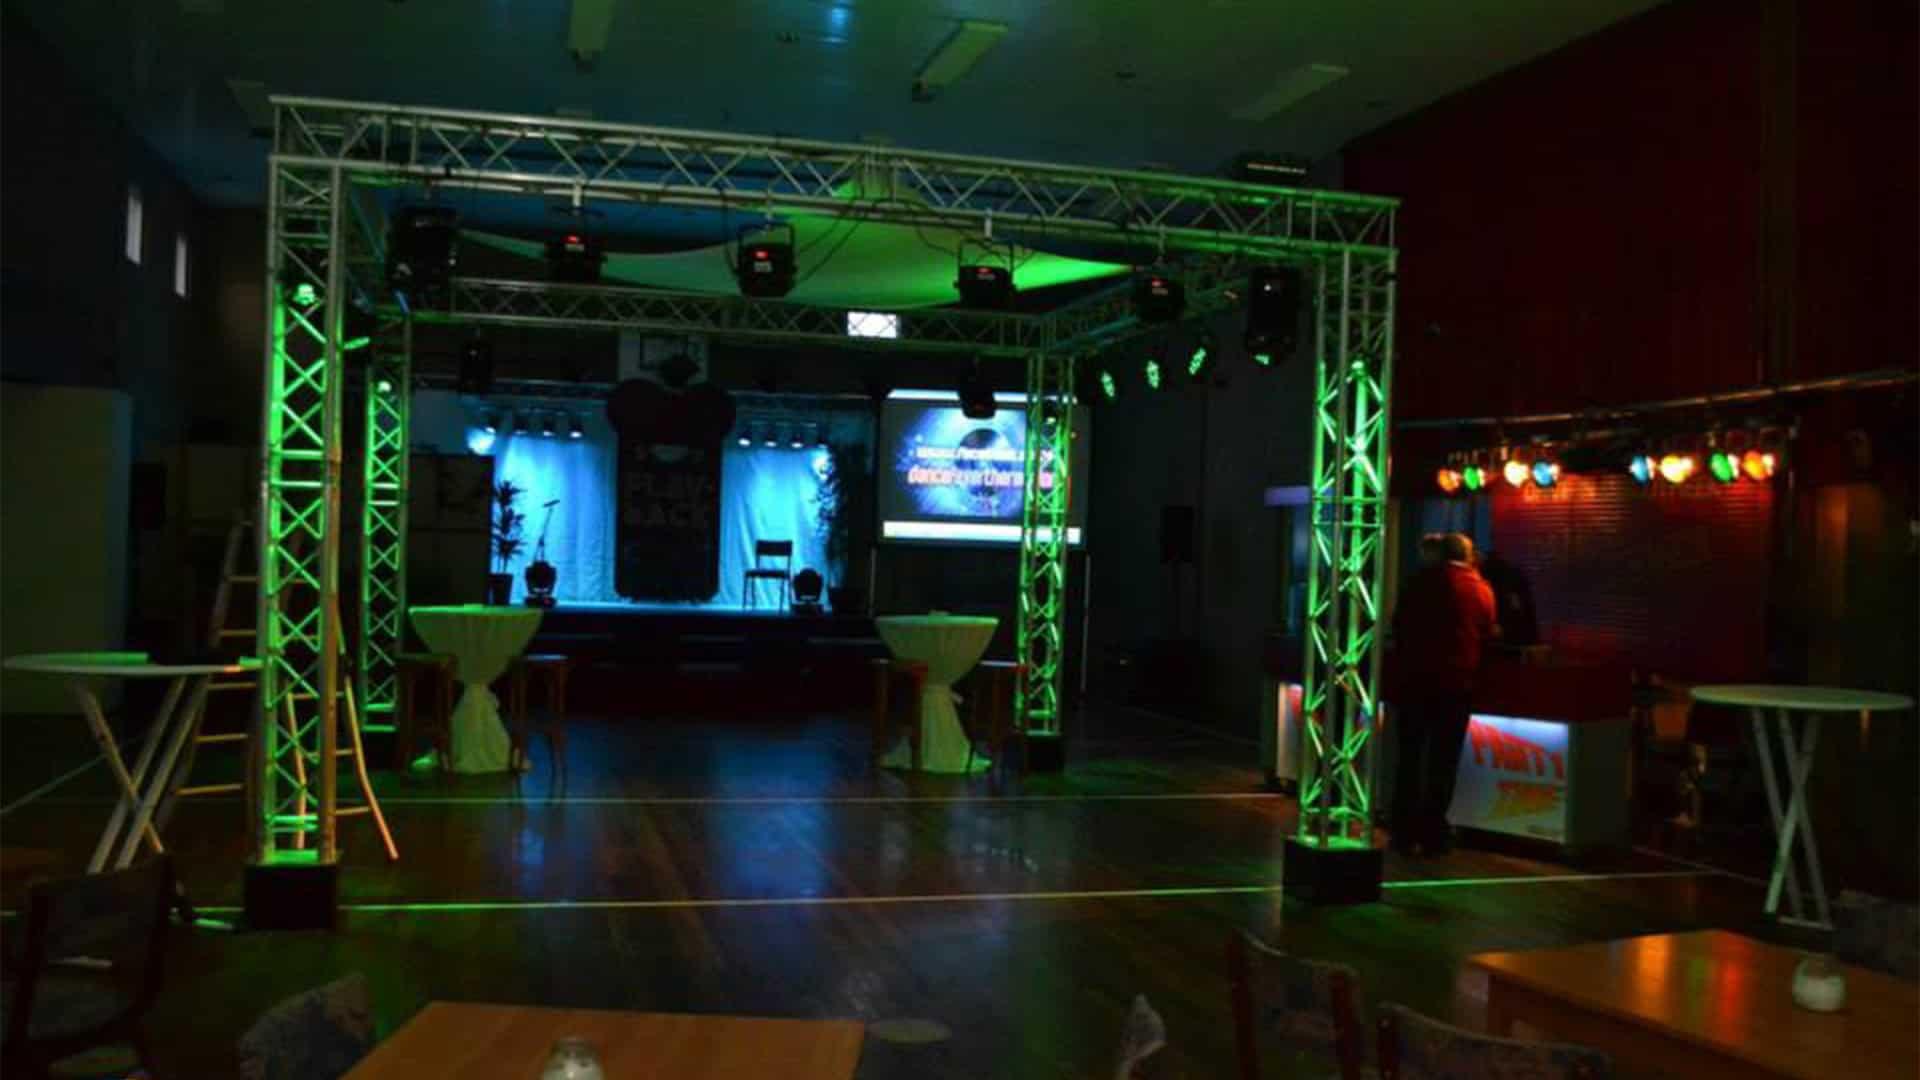 RTV SLOS DANCE Palace